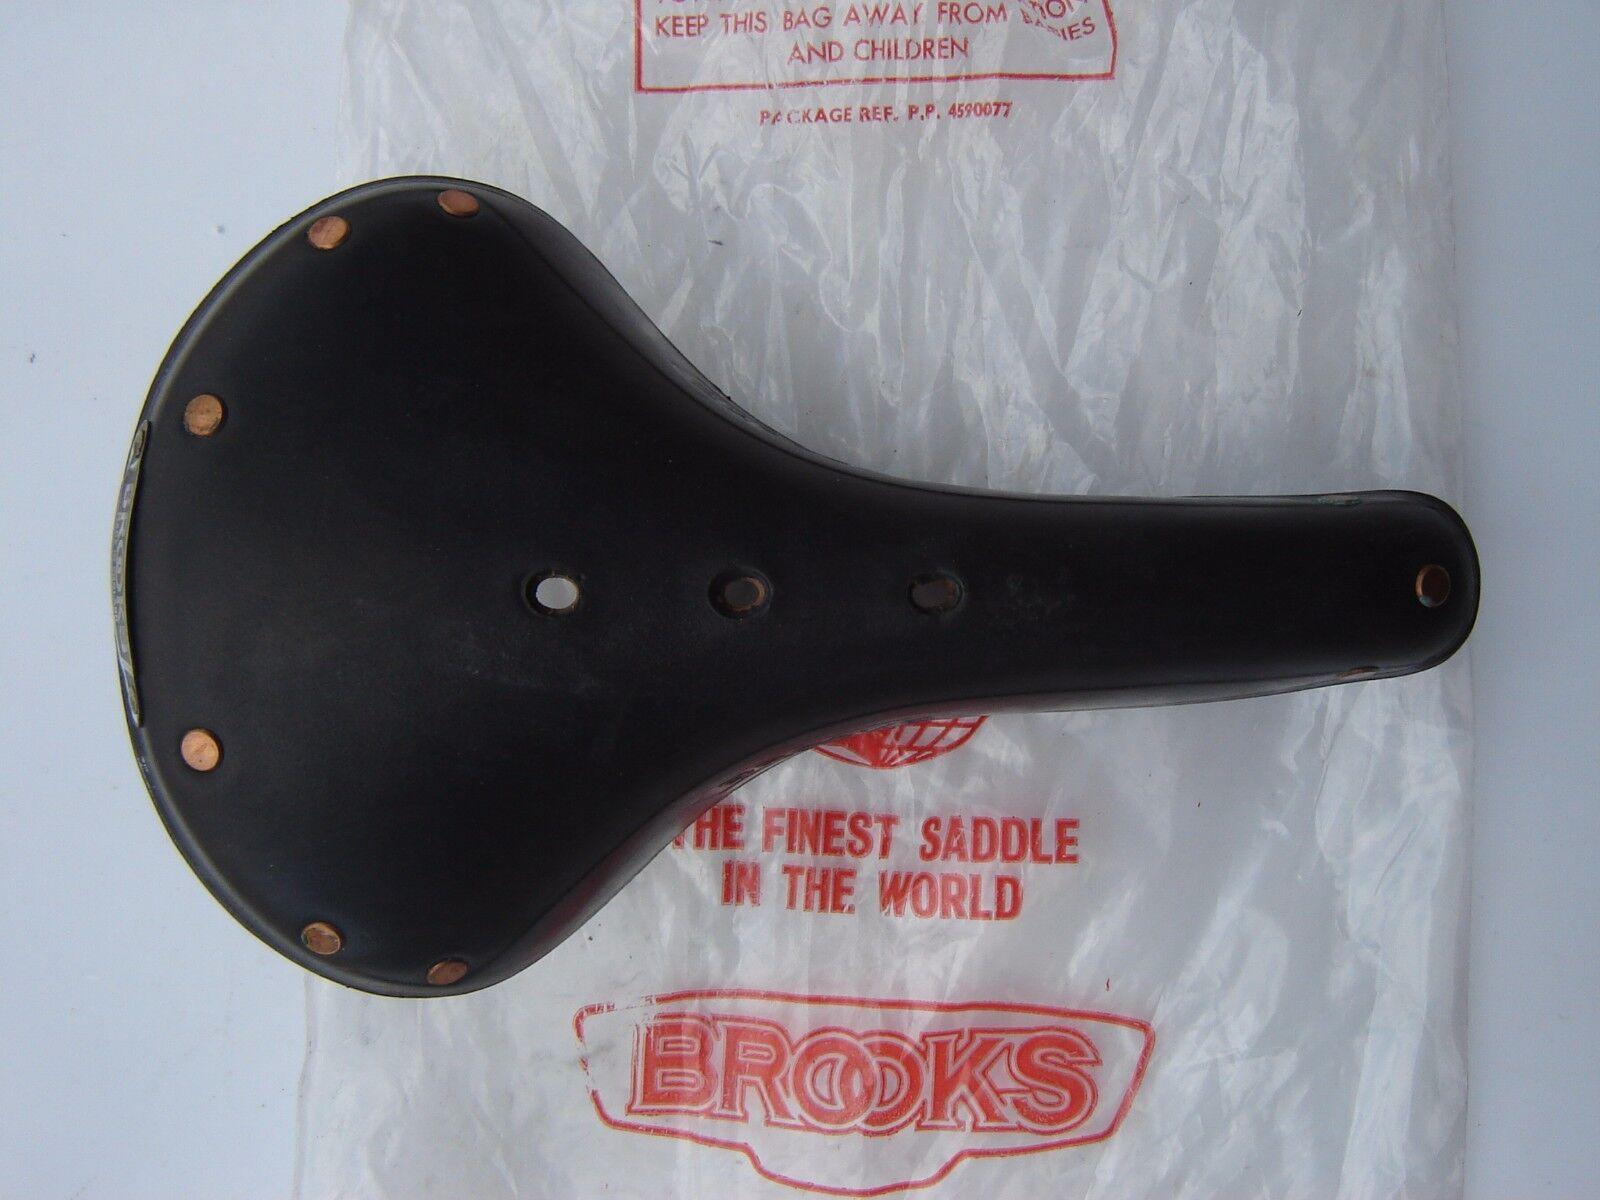 BROOKS VINTAGE B17  CHAMPION STANDARD LEATHER SADDLE - 1977 - NOS - NIP  buy 100% authentic quality